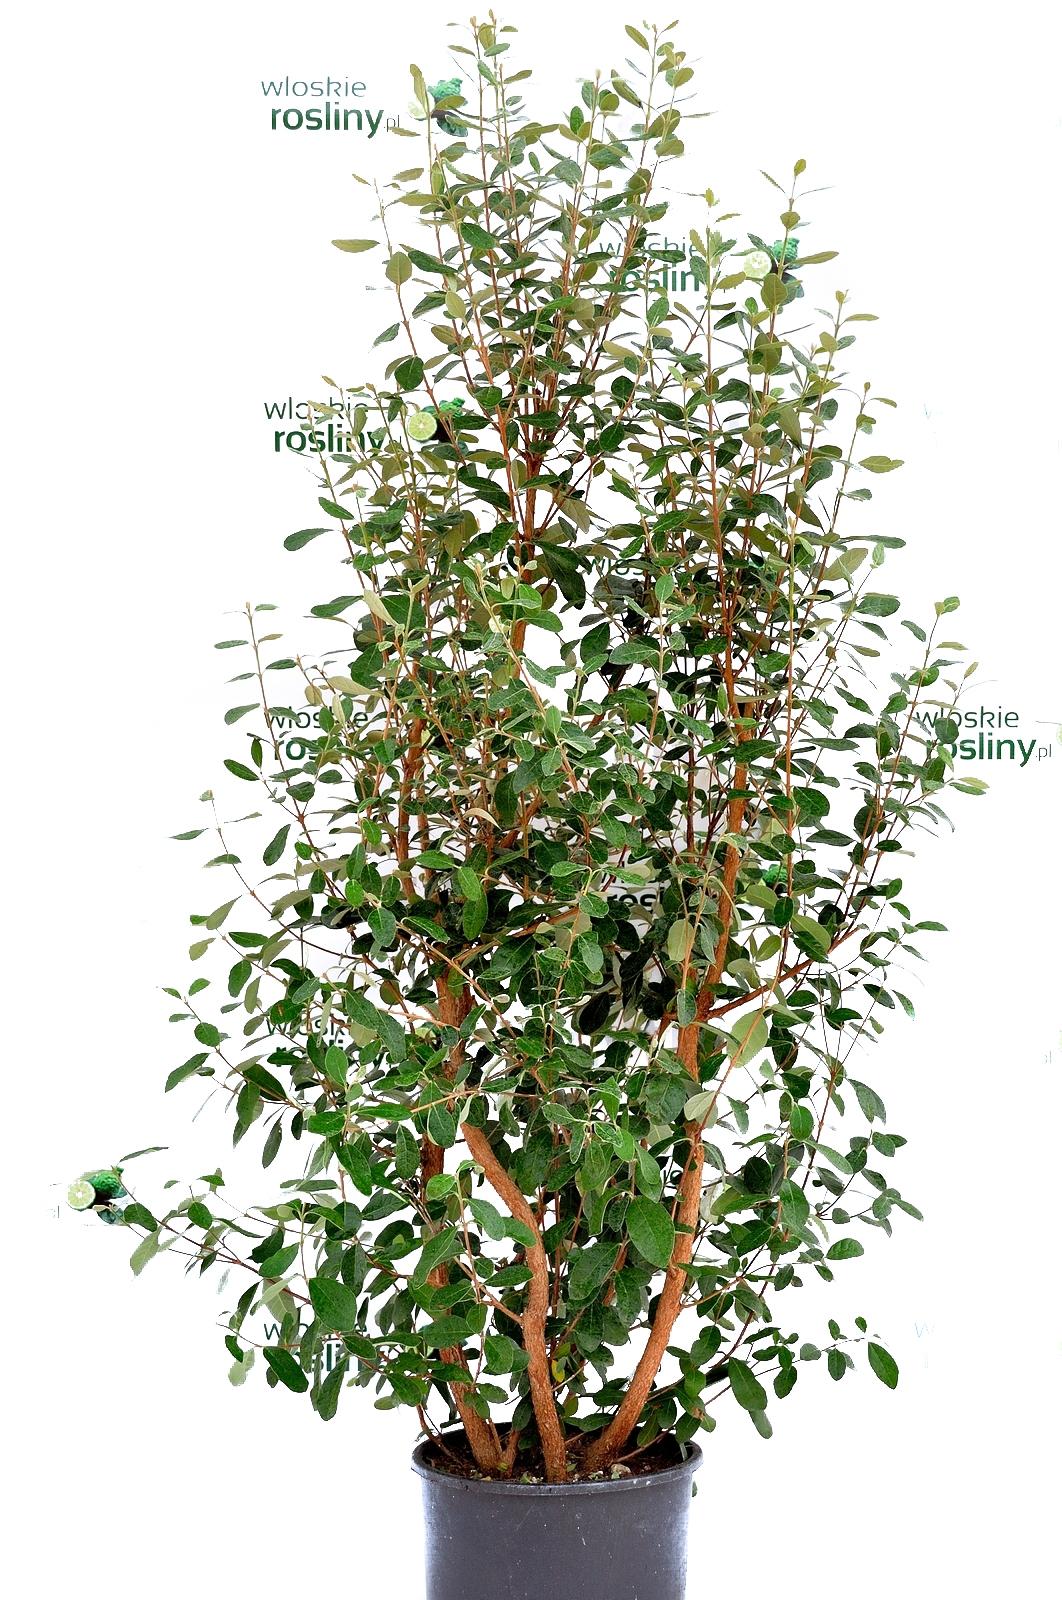 Image of Akka sellowa duży krzew